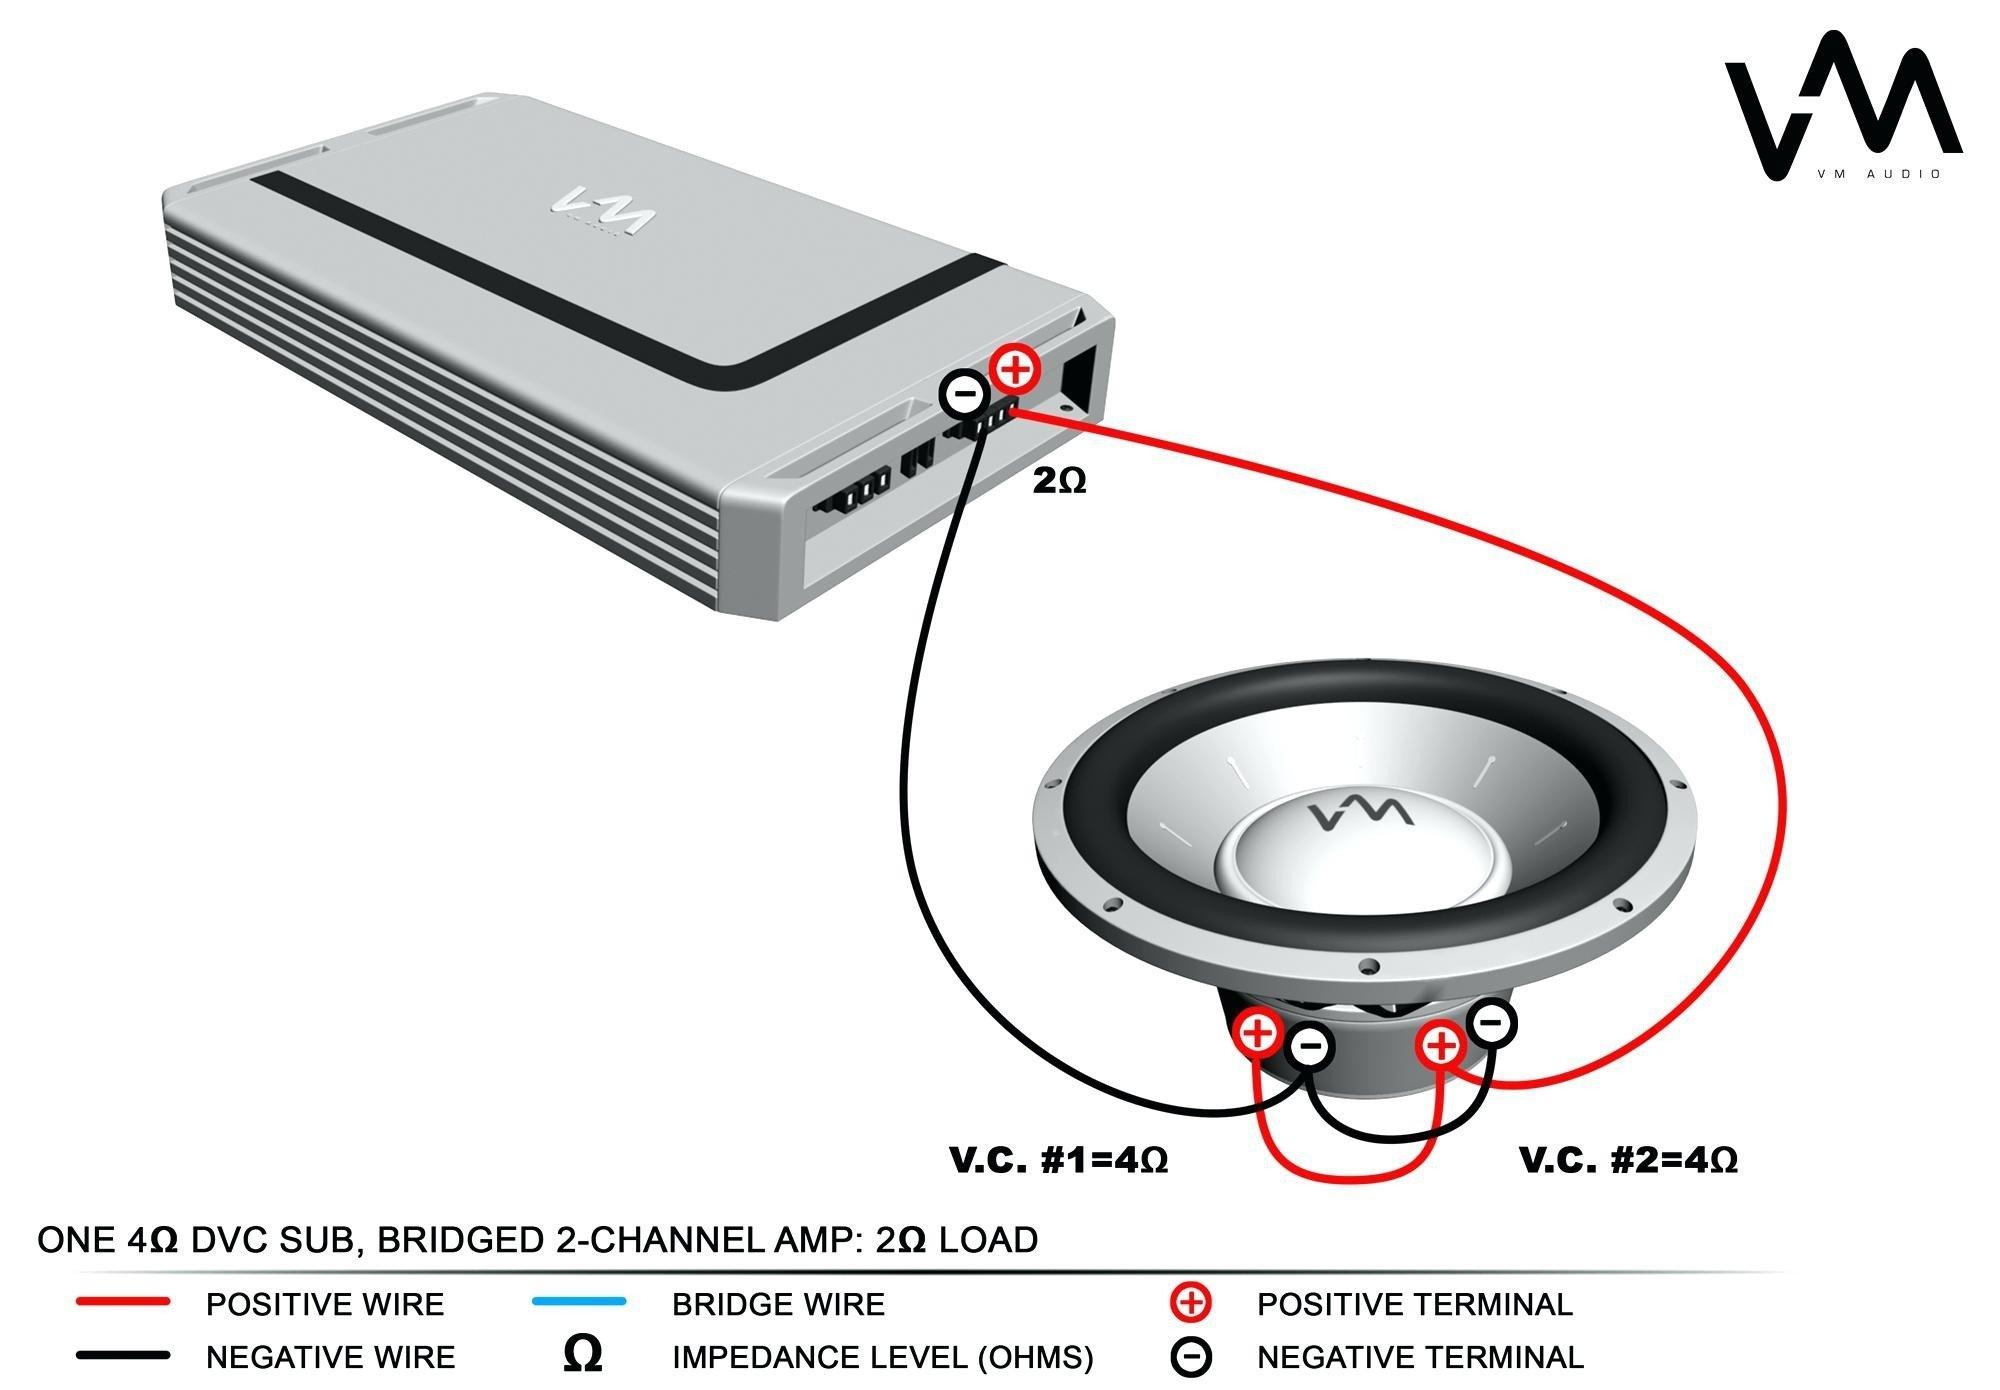 Kicker Comp Wiring Diagram | Manual E-Books - Kicker Comp R 12 Wiring Diagram